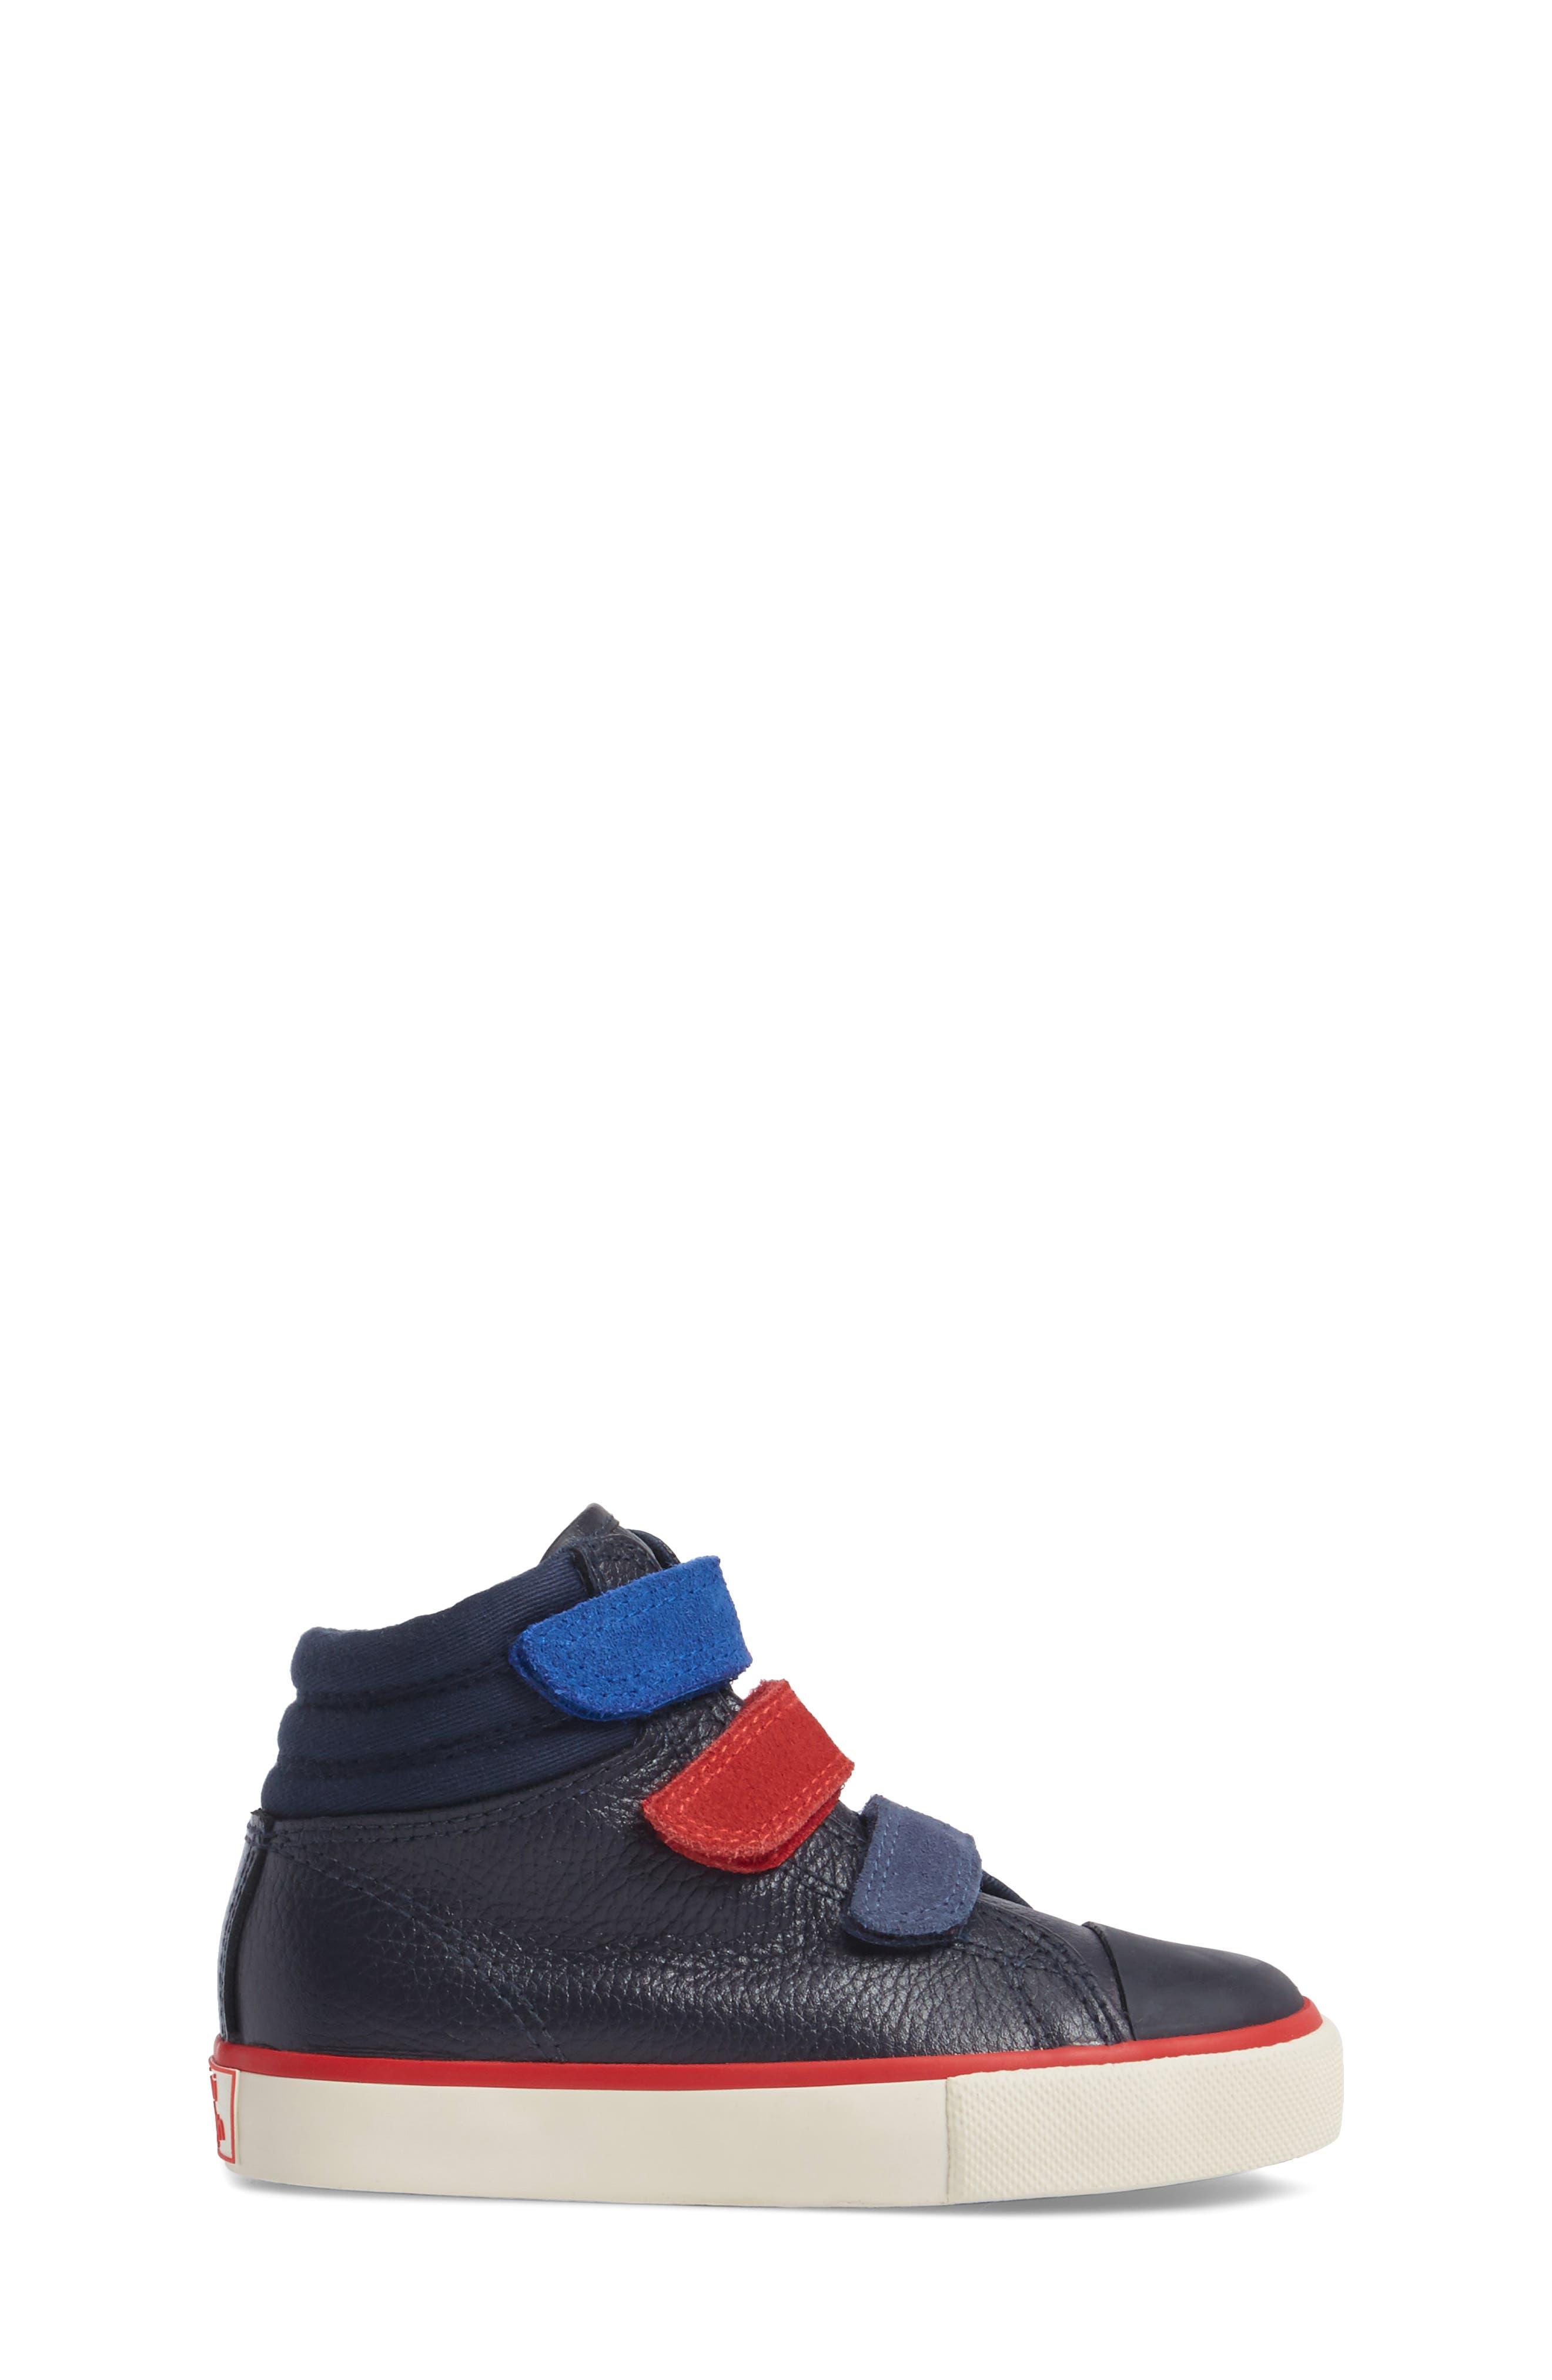 High Top Sneaker,                             Alternate thumbnail 3, color,                             Navy